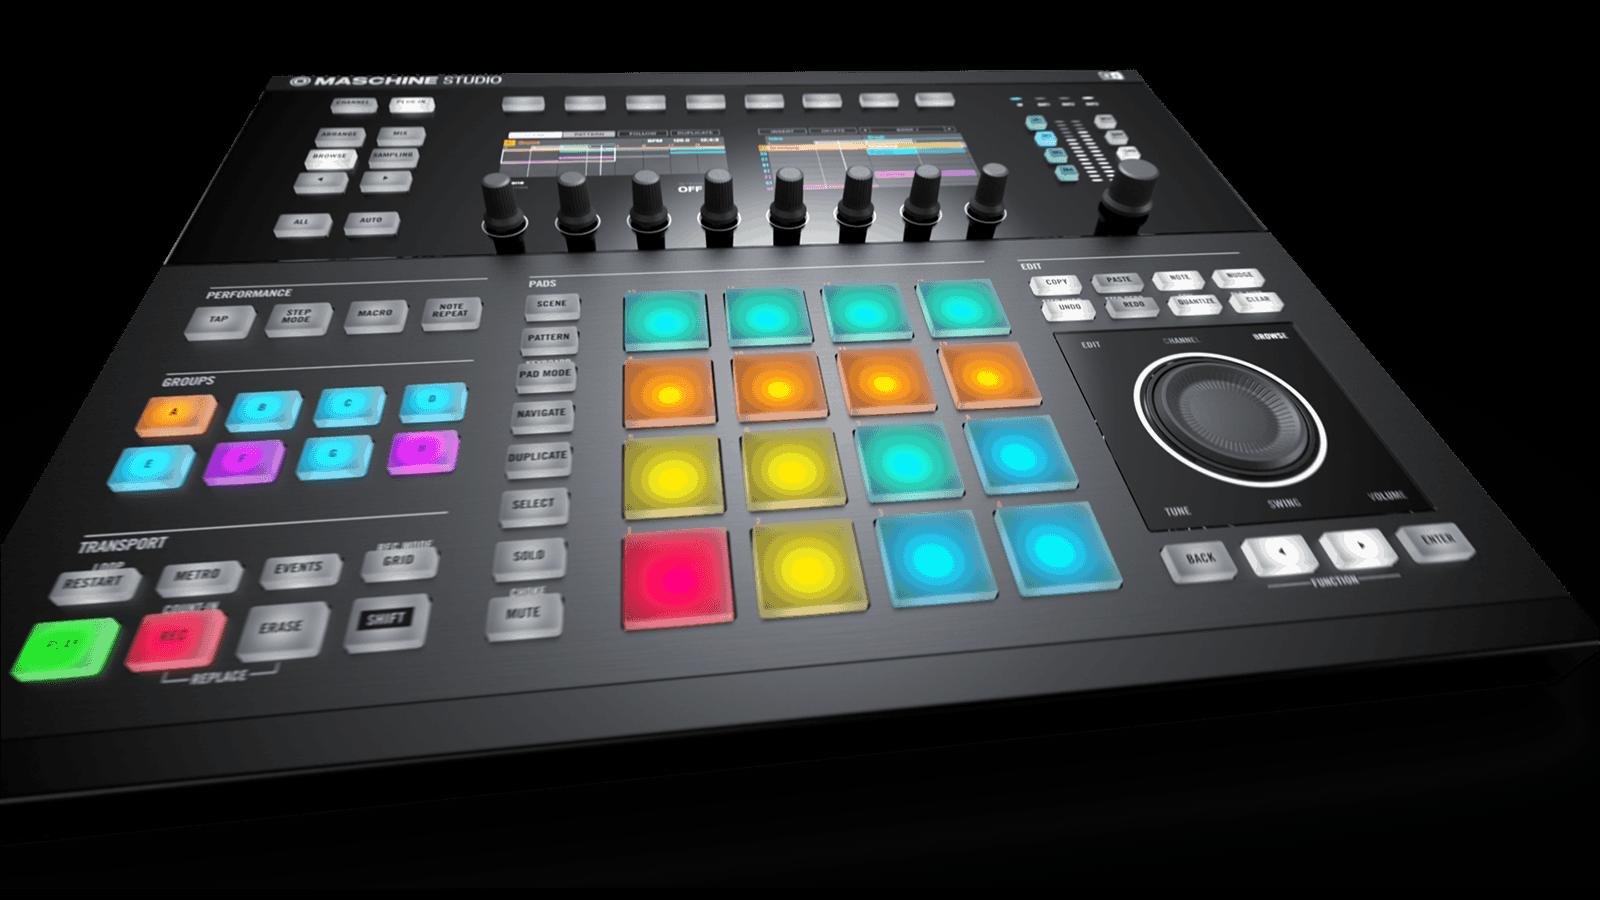 Maschine Studio & Maschine 2 First Look - DJ TechTools